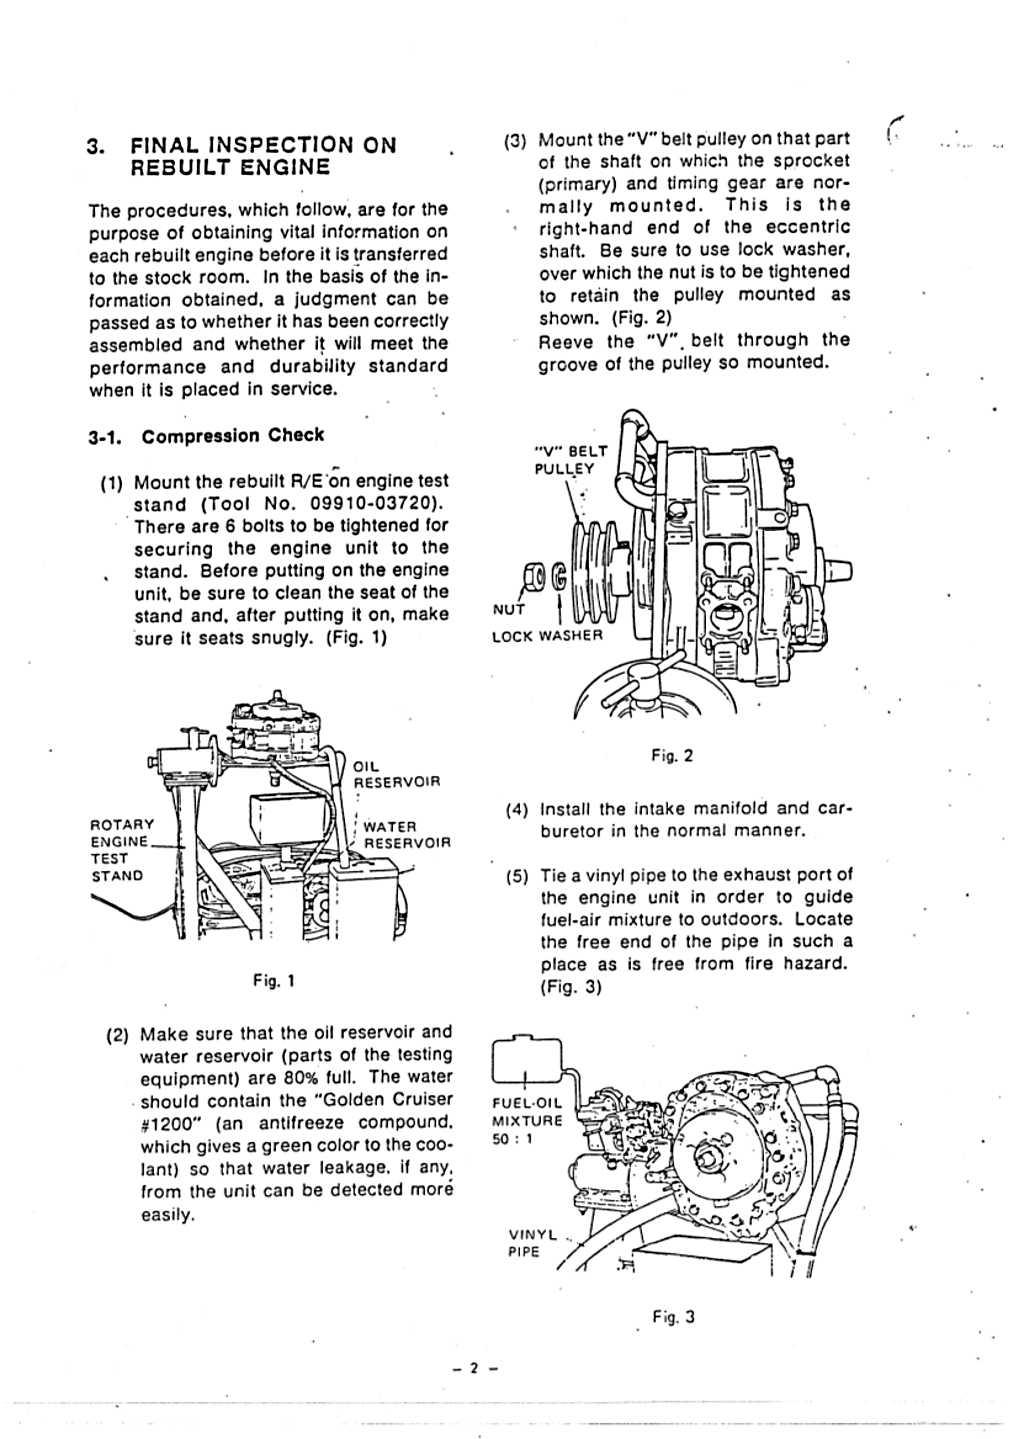 Punto repair manual ebook array mk golf central locking wiring diagram best of free vw wiring rh coverlettertemplate club com fiat punto owners manual ebook fandeluxe Gallery